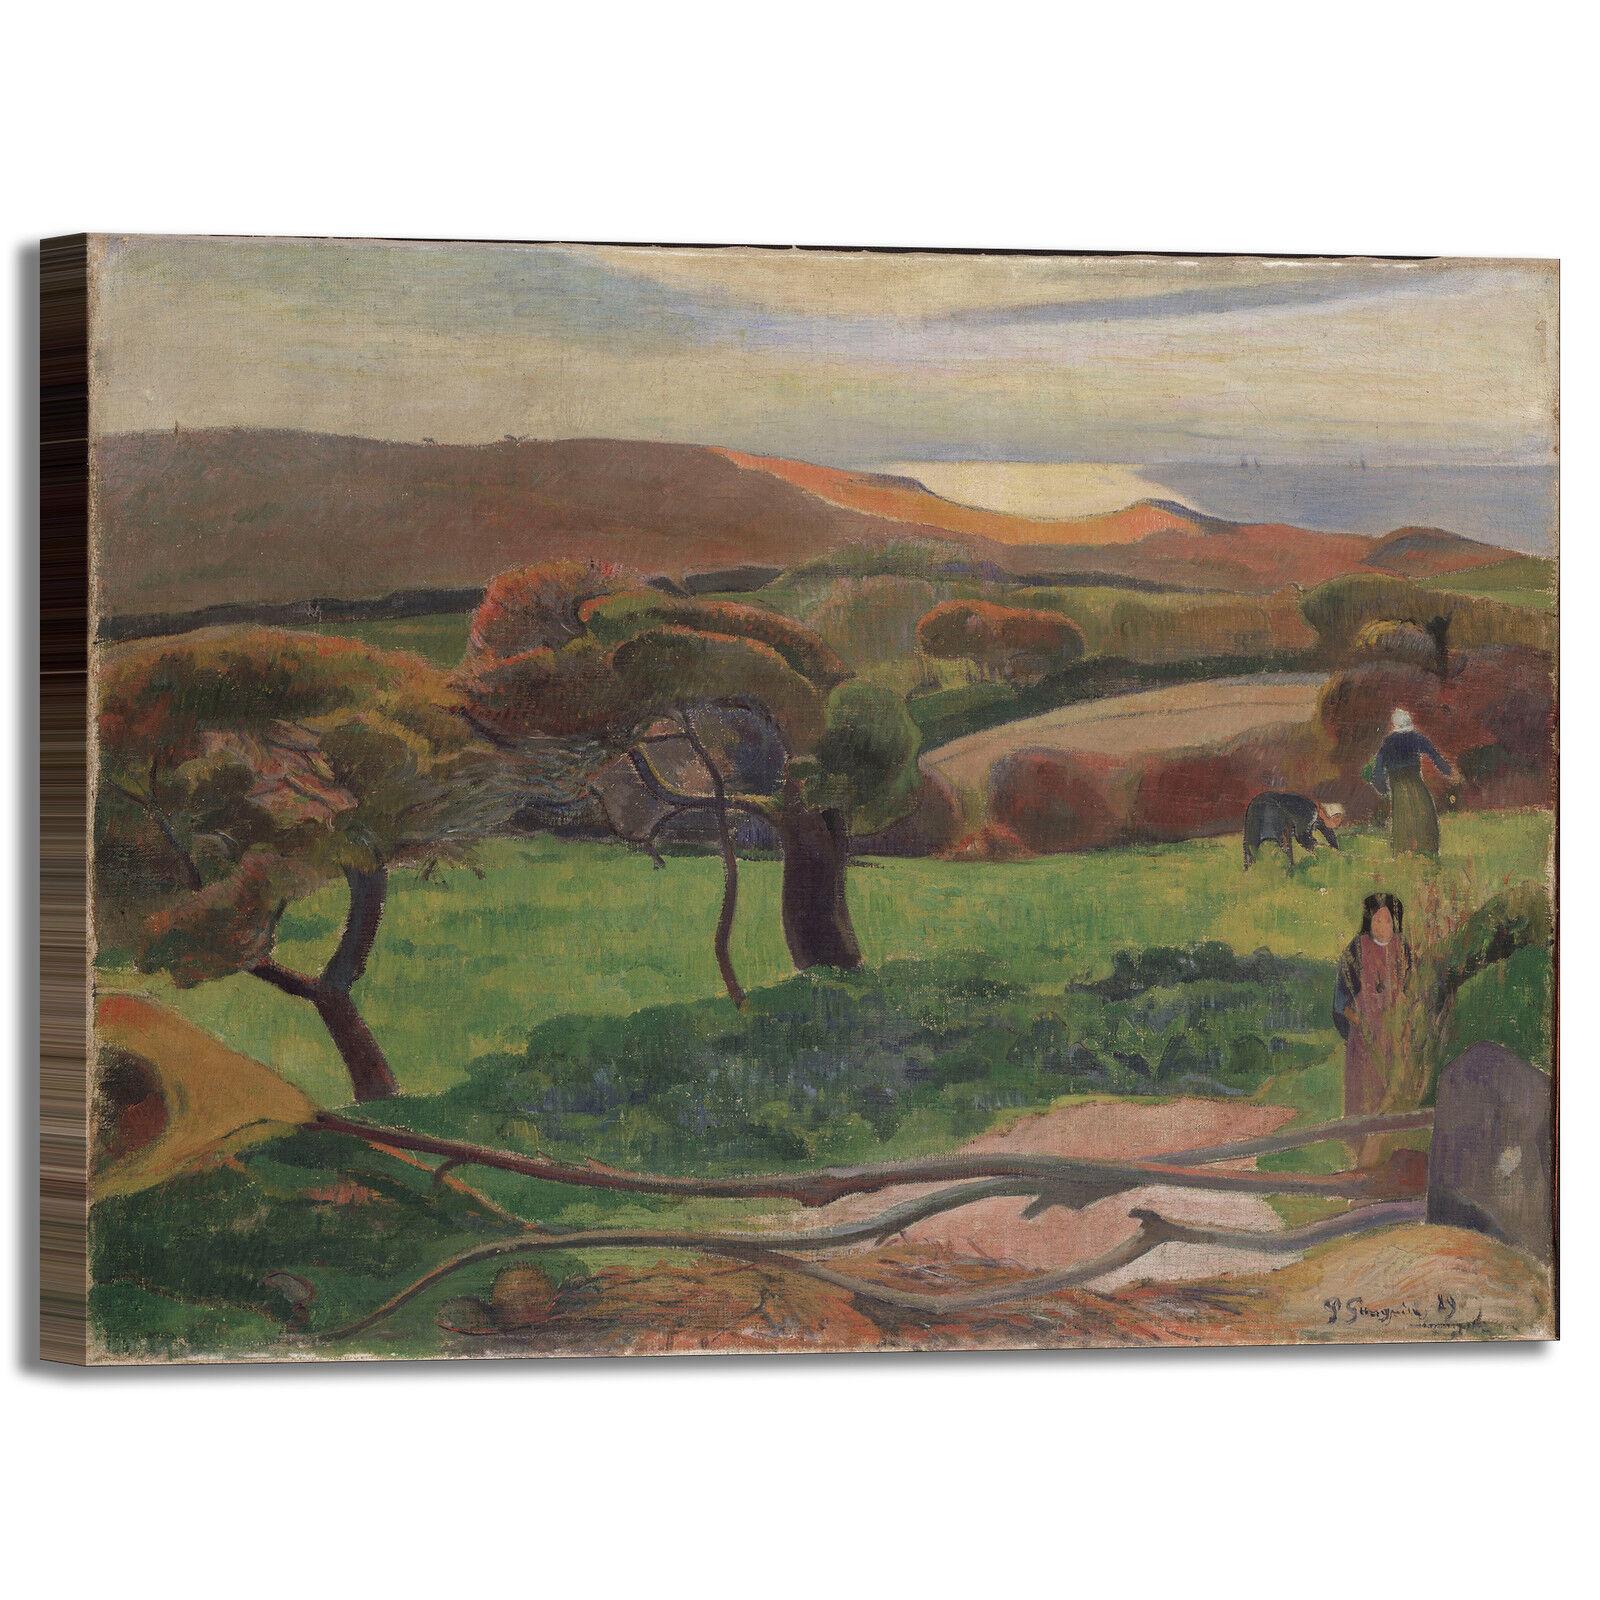 Gauguin paesaggio bretagna 2 quadro stampa tela dipinto telaio telaio dipinto arRouge o casa 3c9af7